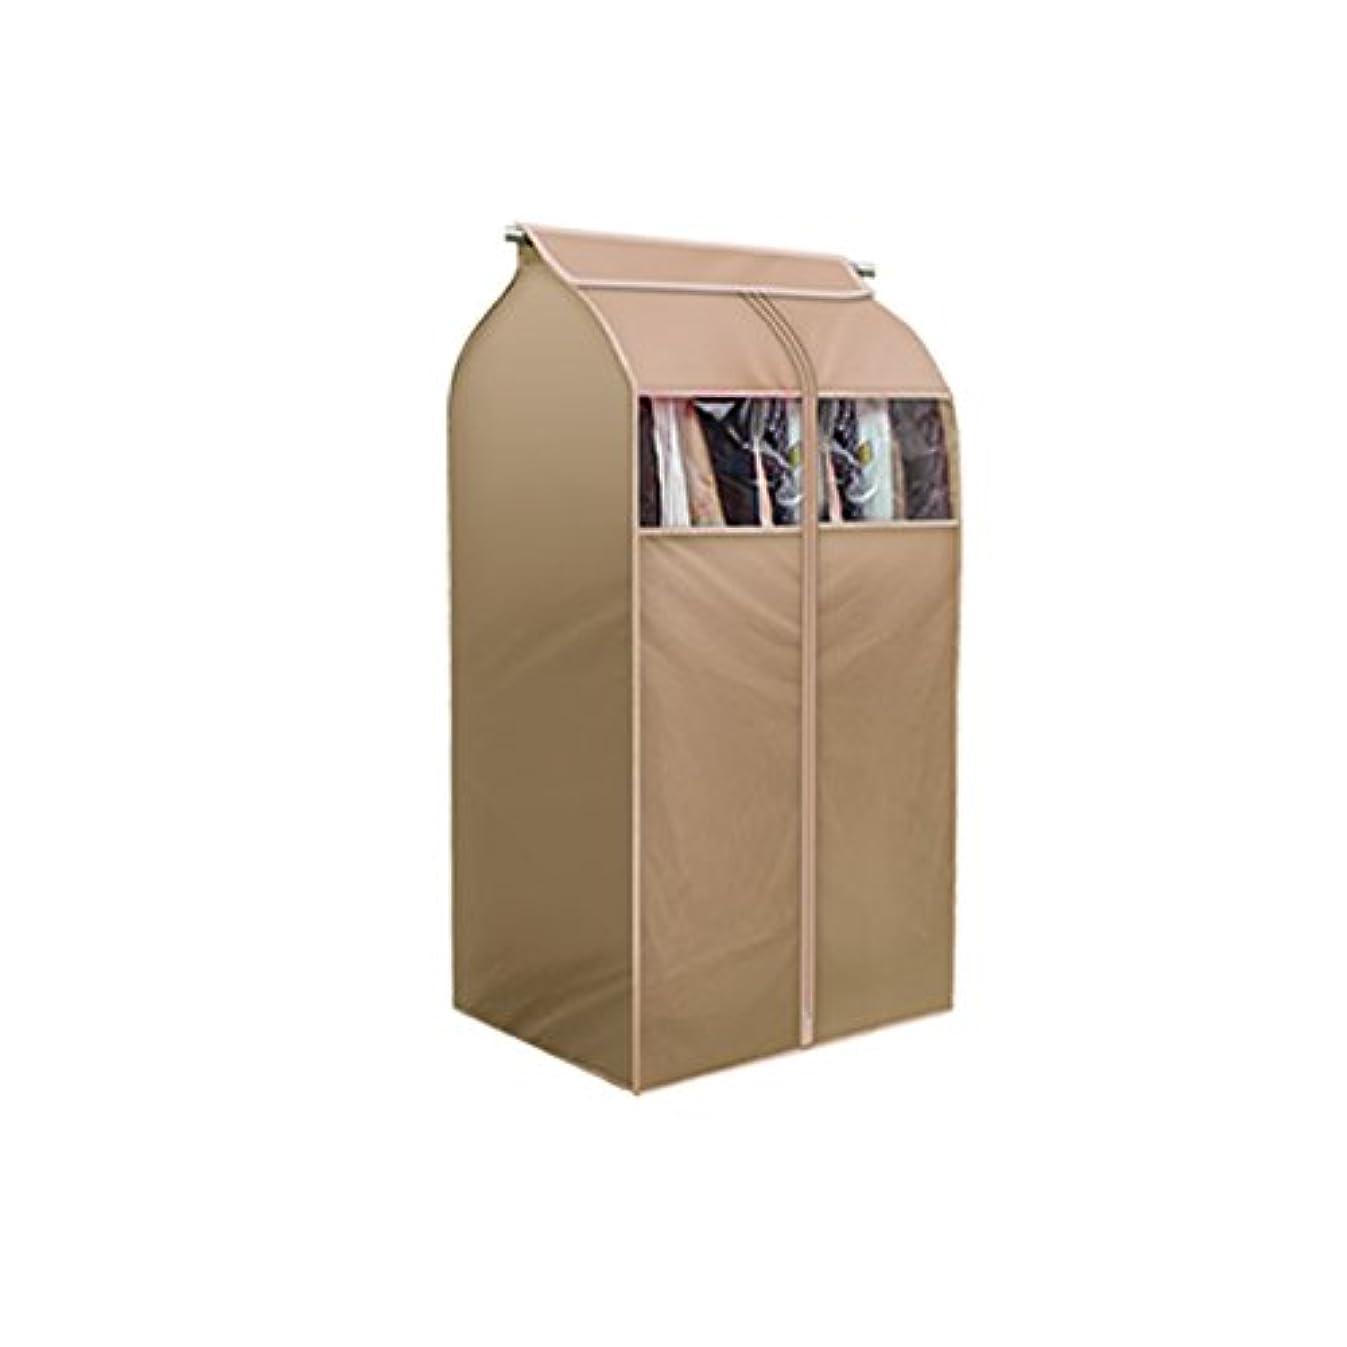 Tsing 1 Pack Garment Cover 420D Nylon Oxford Fabric Storage Bag-Beige-32''W23''D43''H